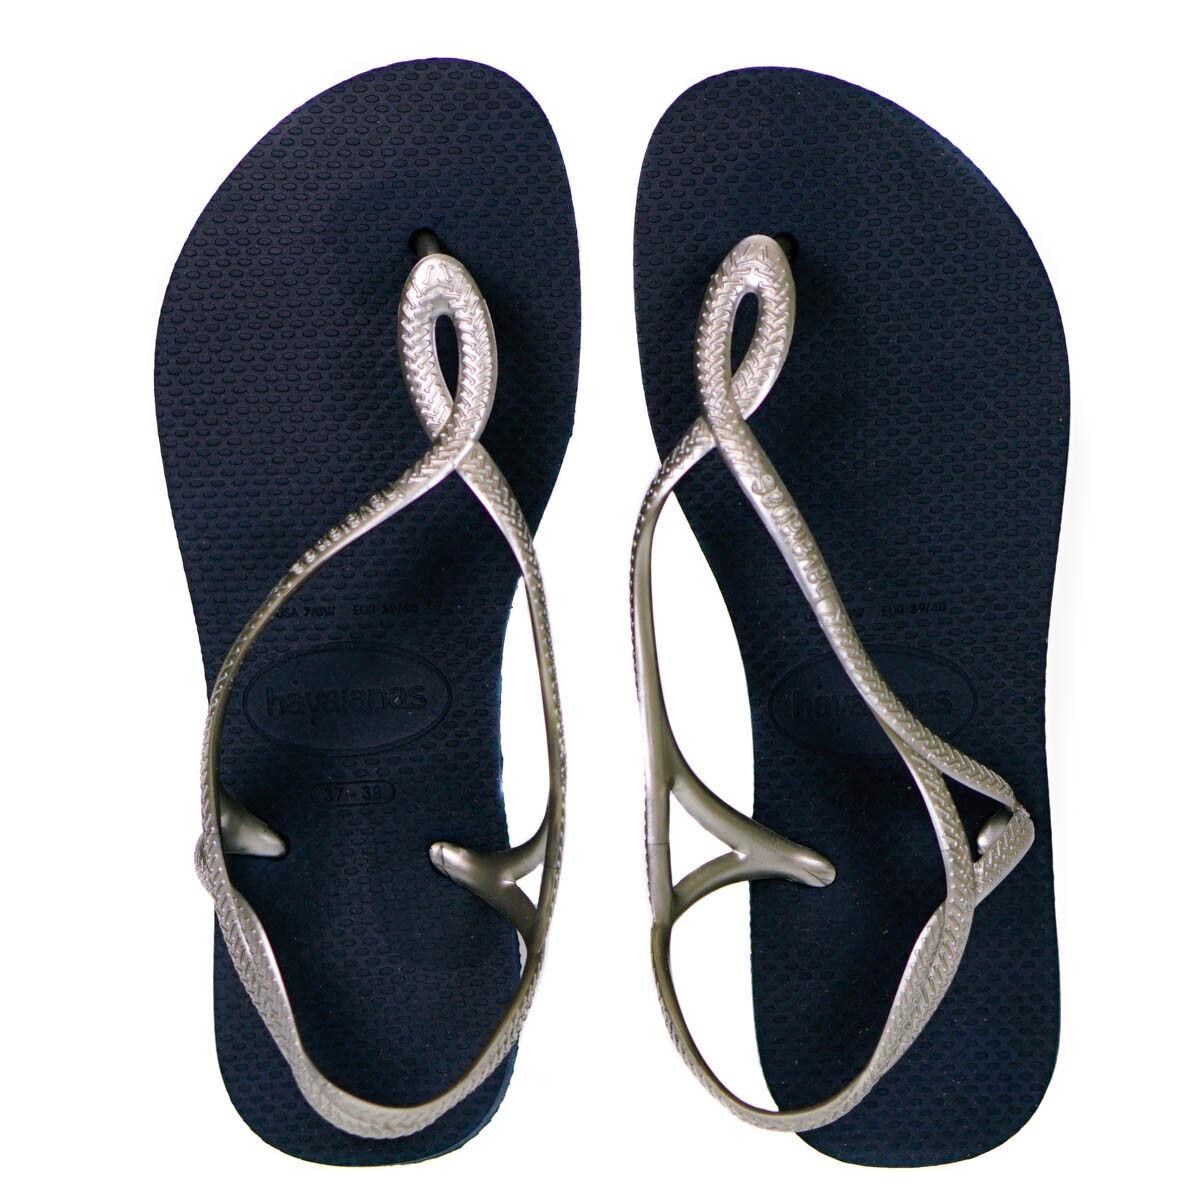 Havaianas LUNA azul marino y Plata Flip Flop Sandalias Size Uk 7//8 euro 41//42